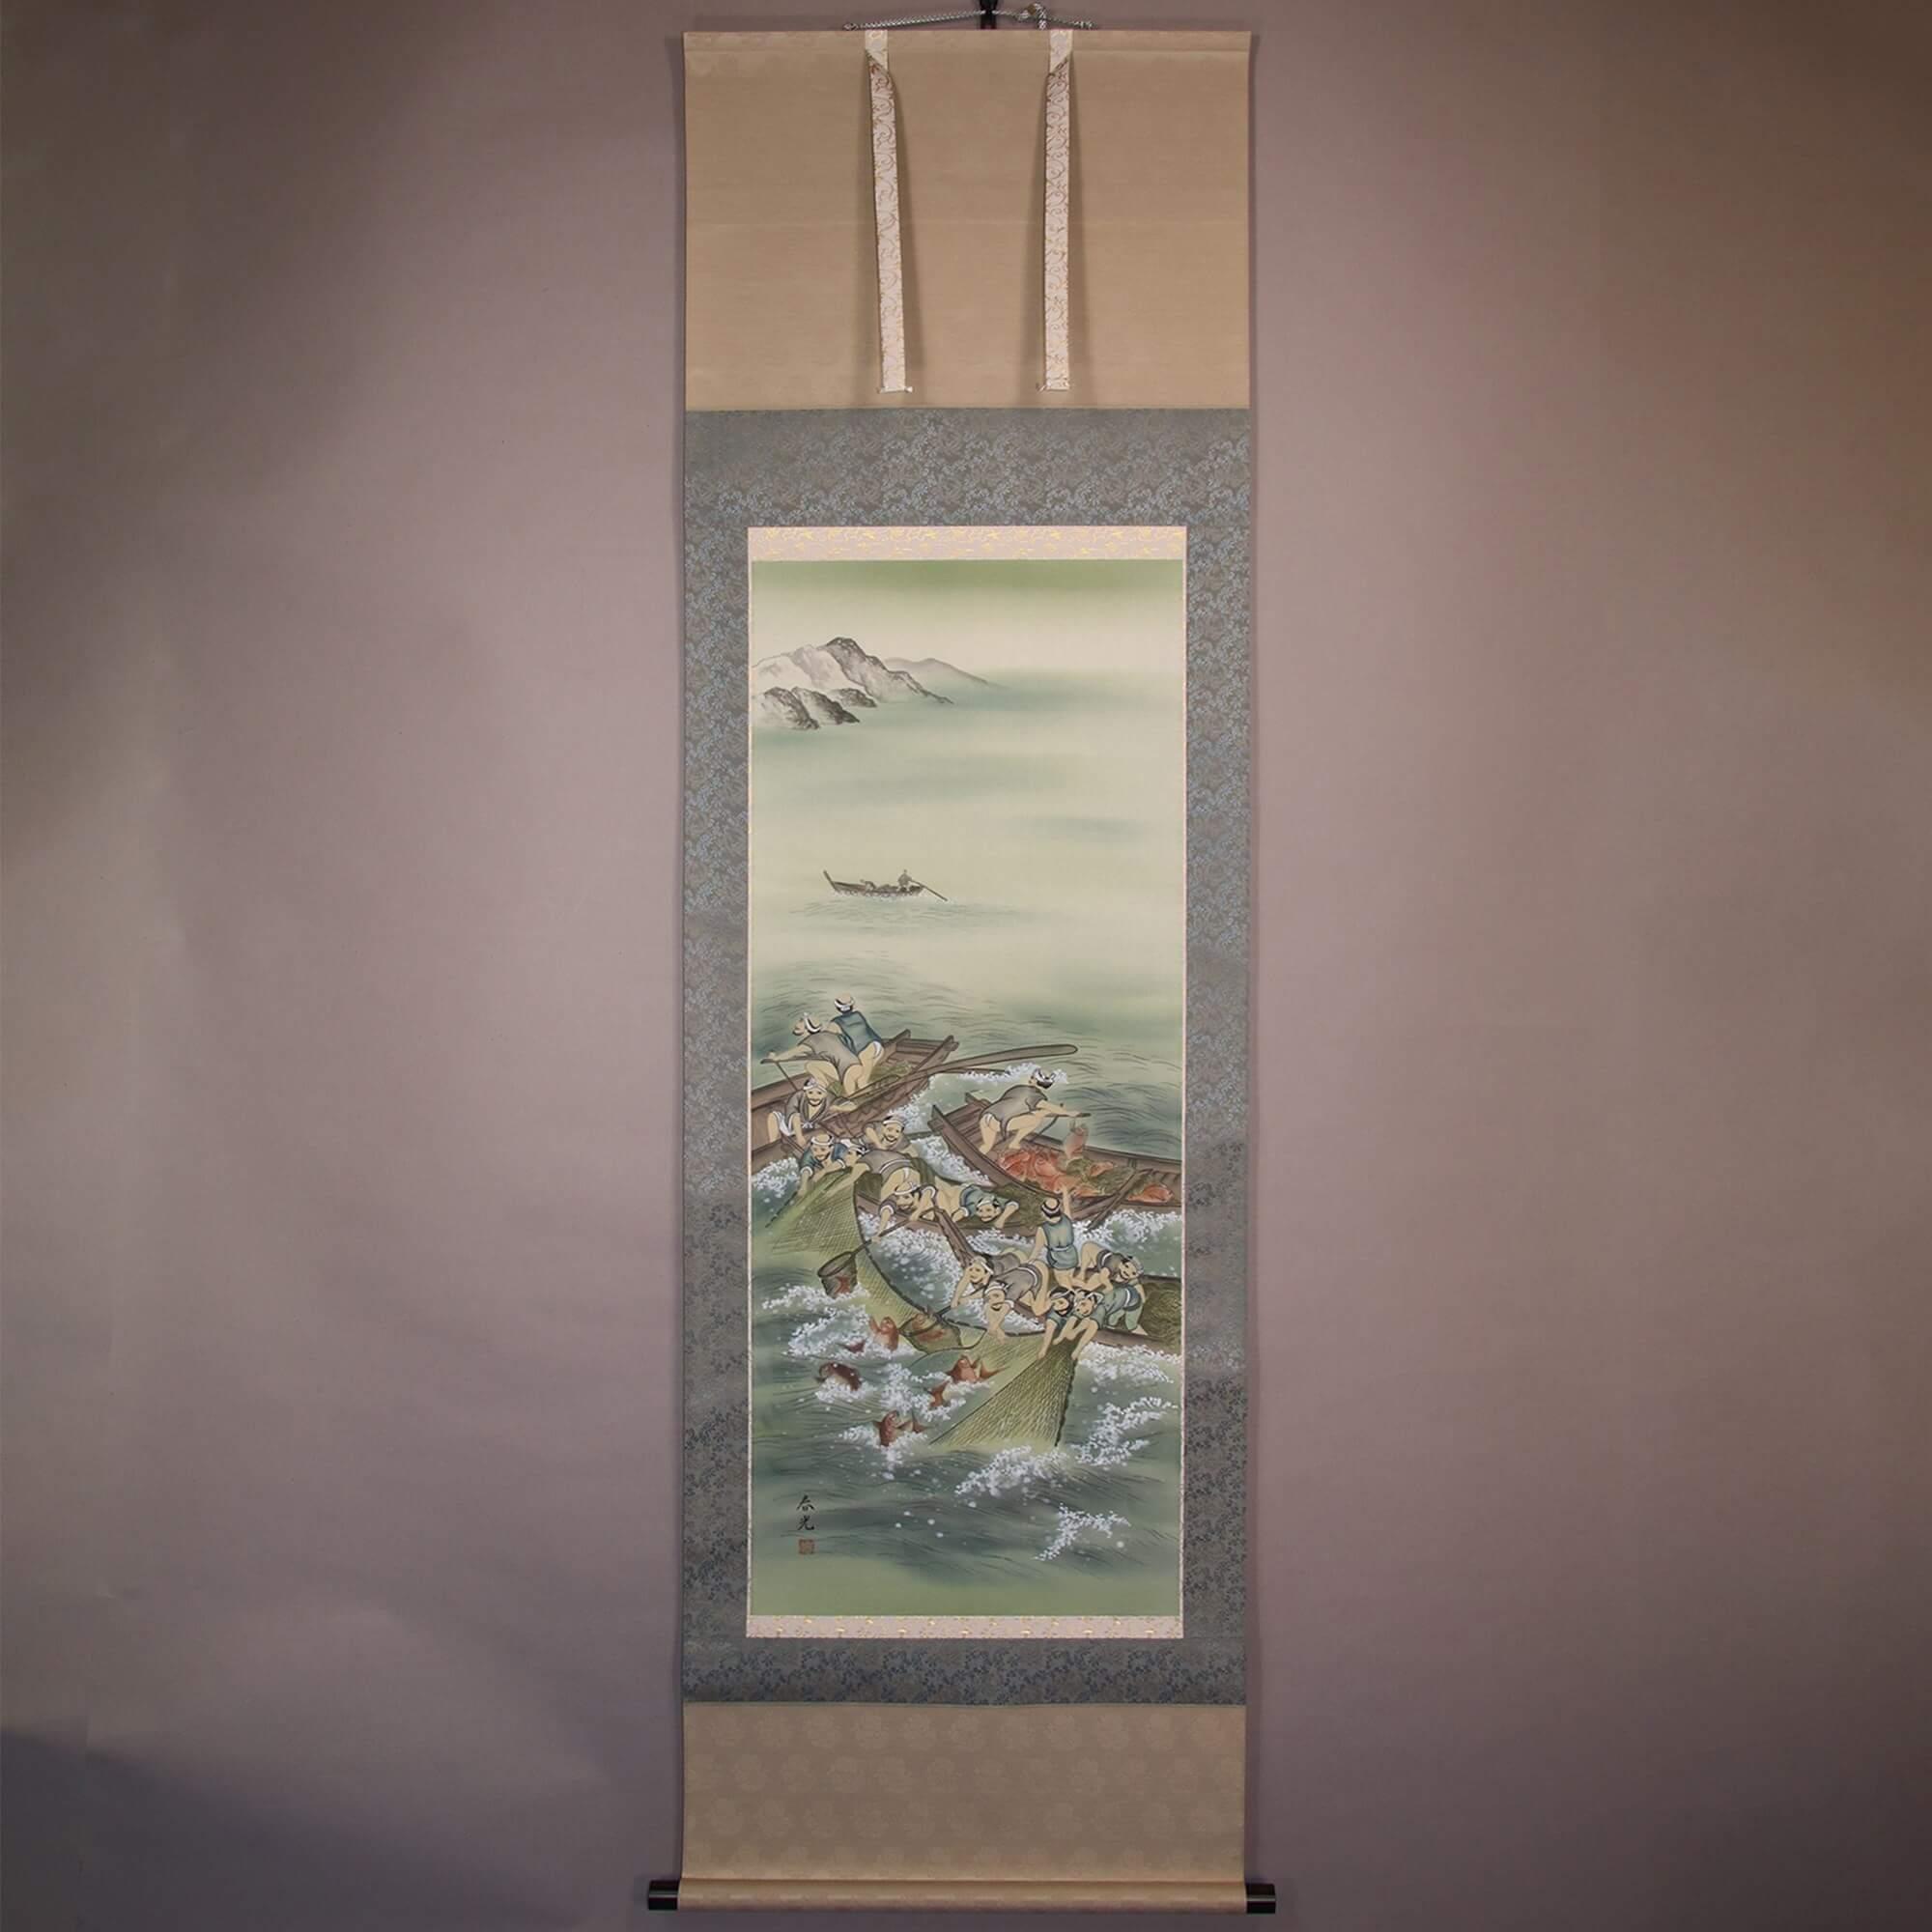 Painting of a Big Catch / Masuda Shunkō